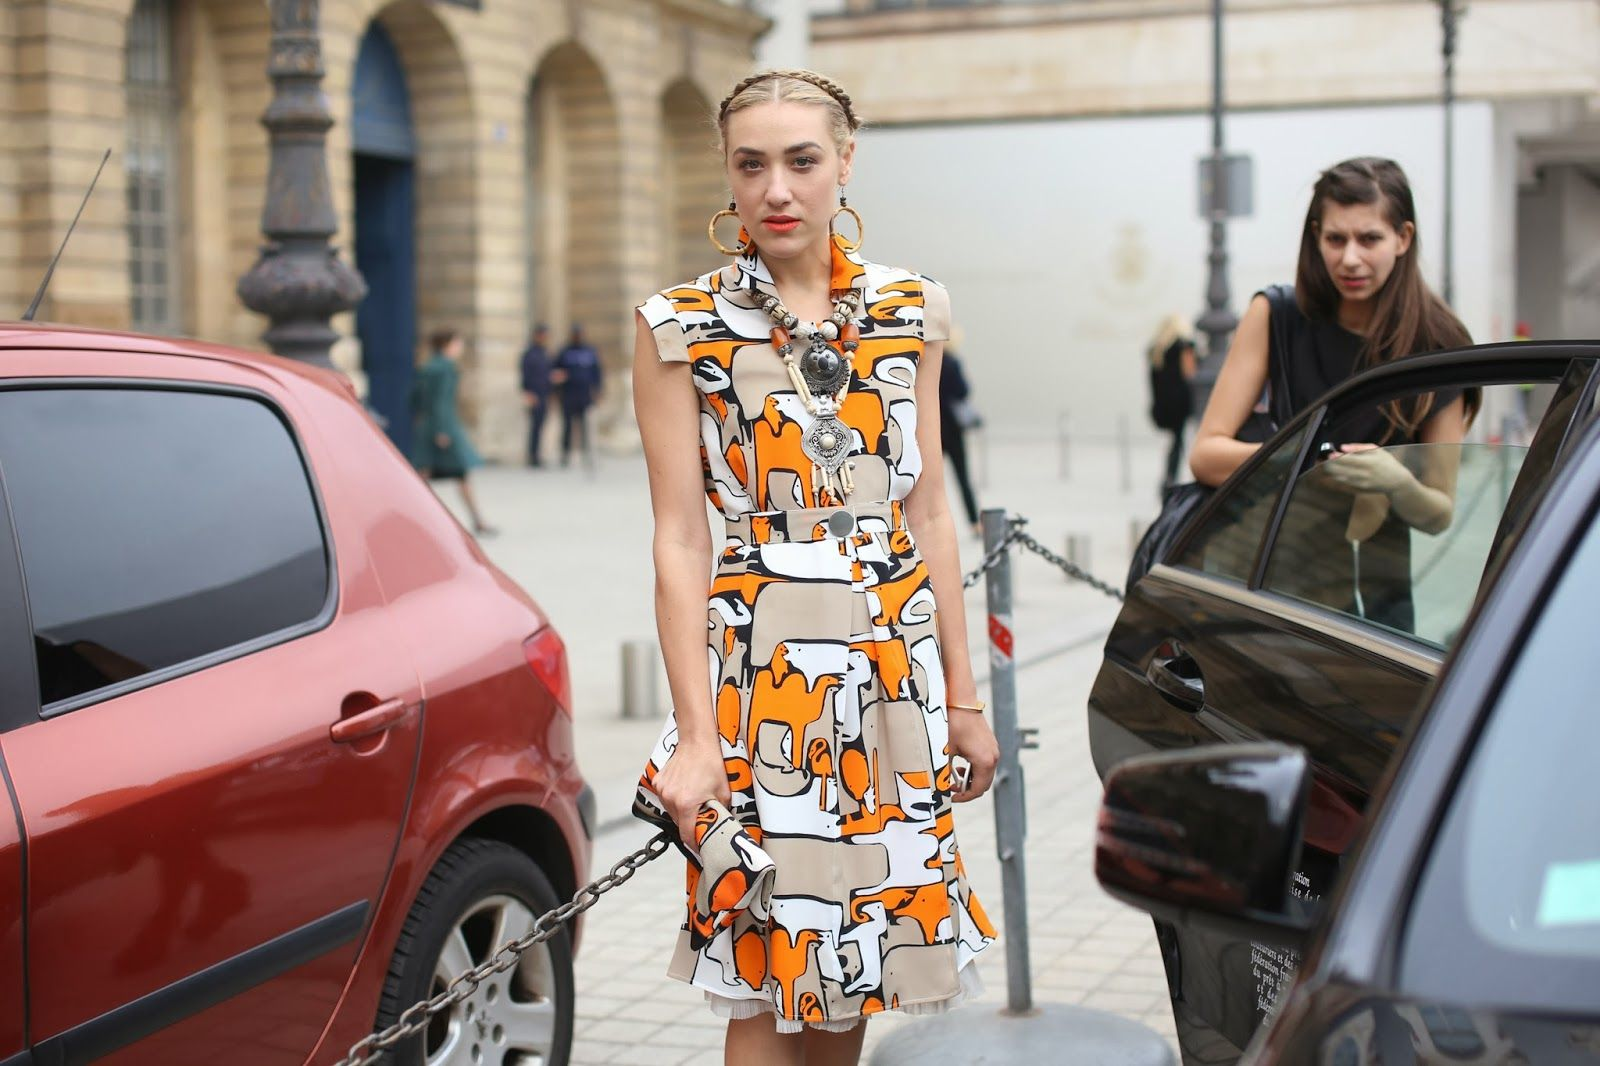 #SwitchMagazine - The #Braves Of #Fashion Story: #MiaMoretti